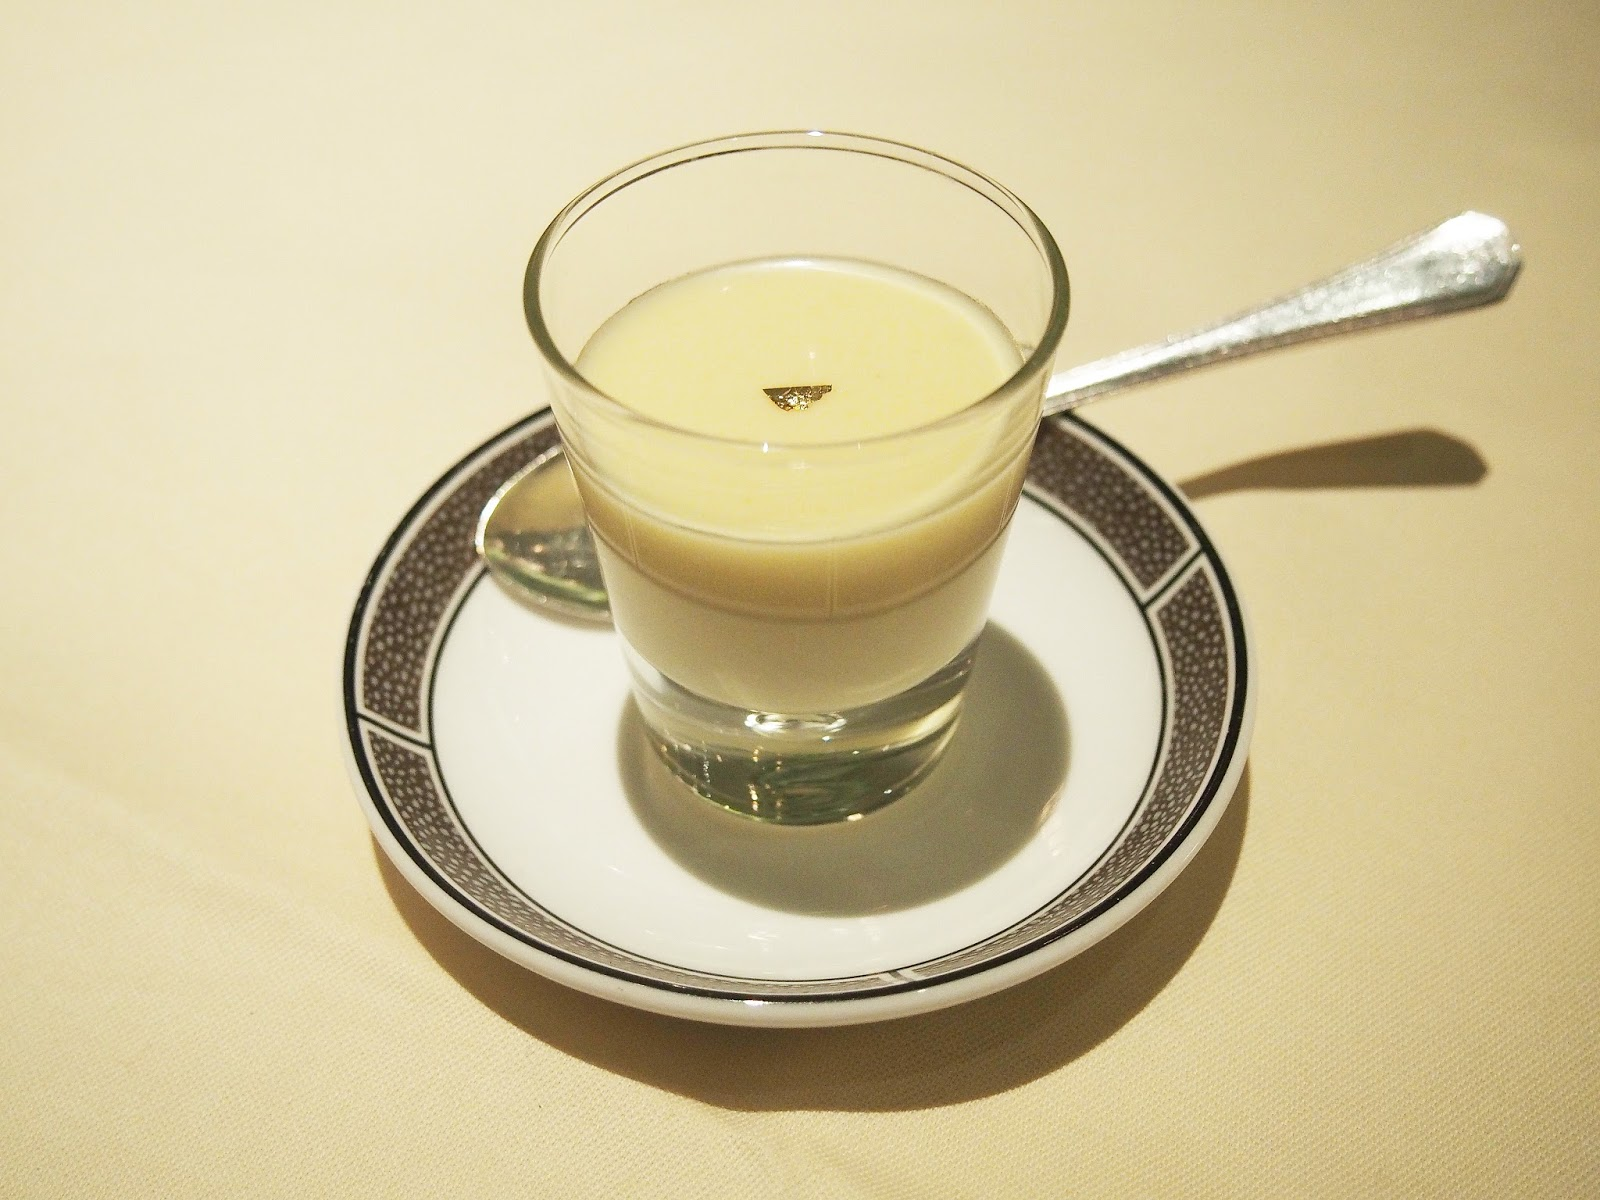 Nutcracker Festive Afternoon Tea At The Langham Hotel